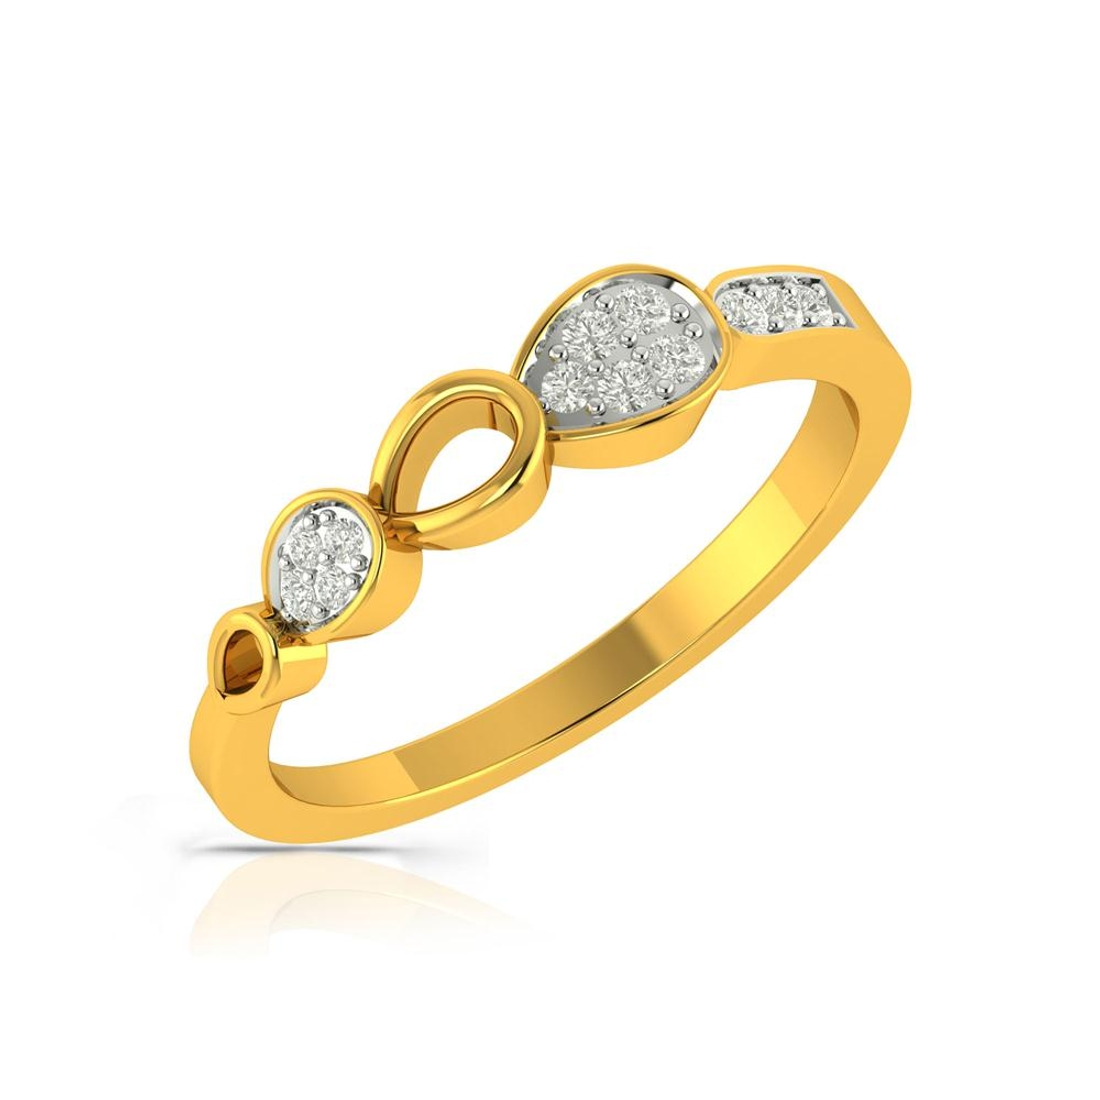 Buy Charu Jewels Diamond Ladies Ring CJLR0448 Online in India